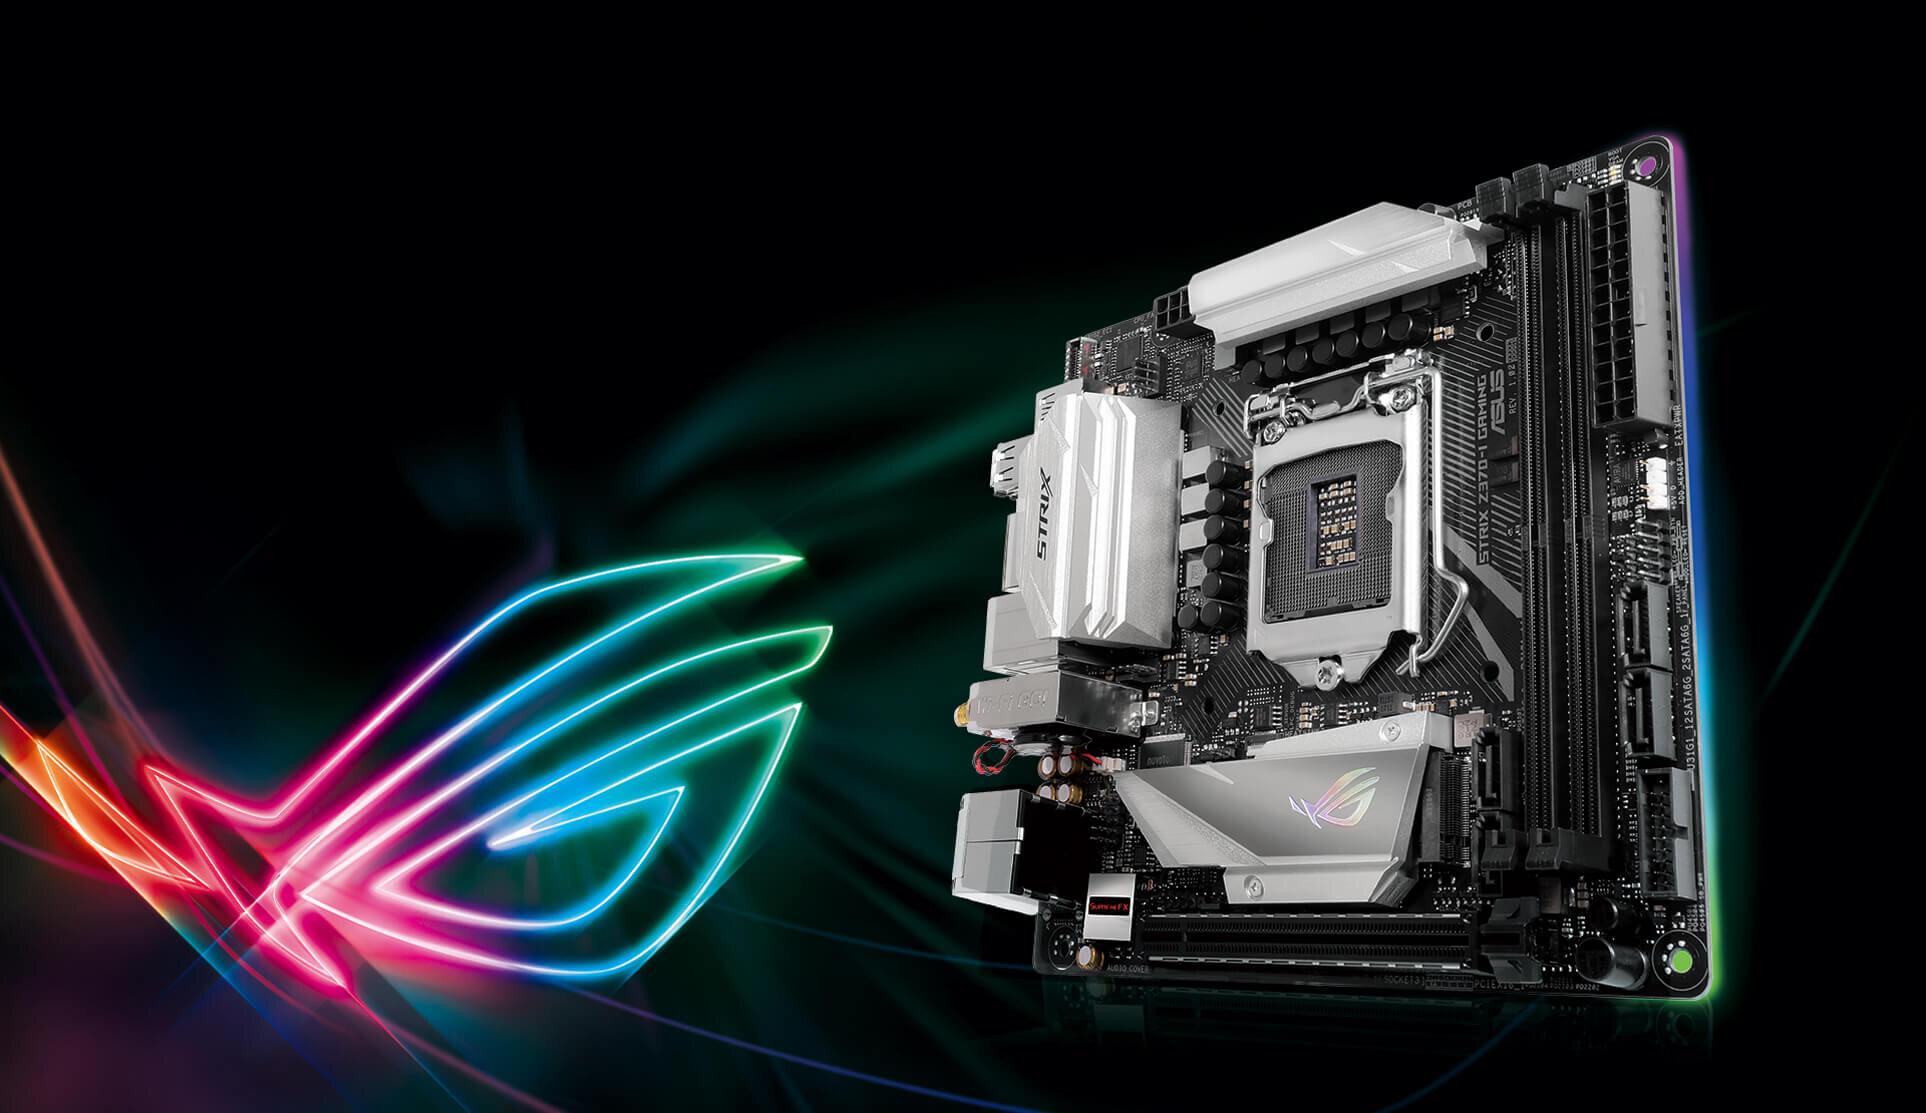 Bo mạch ASUS ROG STRIX Z370-i GAMING giá rẻ